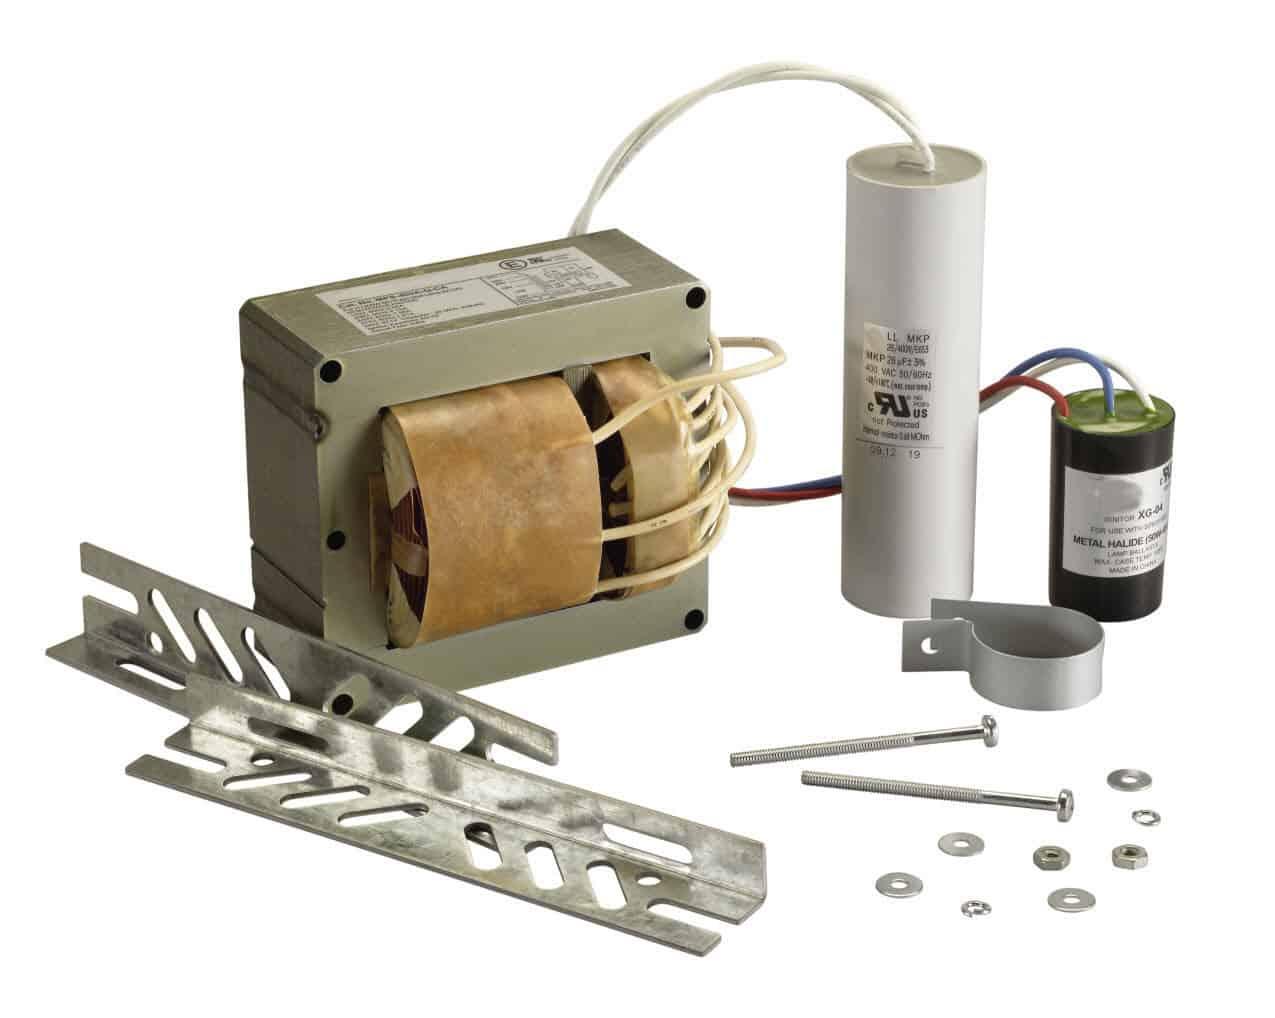 250 Watt Ballast Wiring Diagram - Wiring Liry Diagram A5 Ge W Metal Halide Ballast Wiring Diagram on